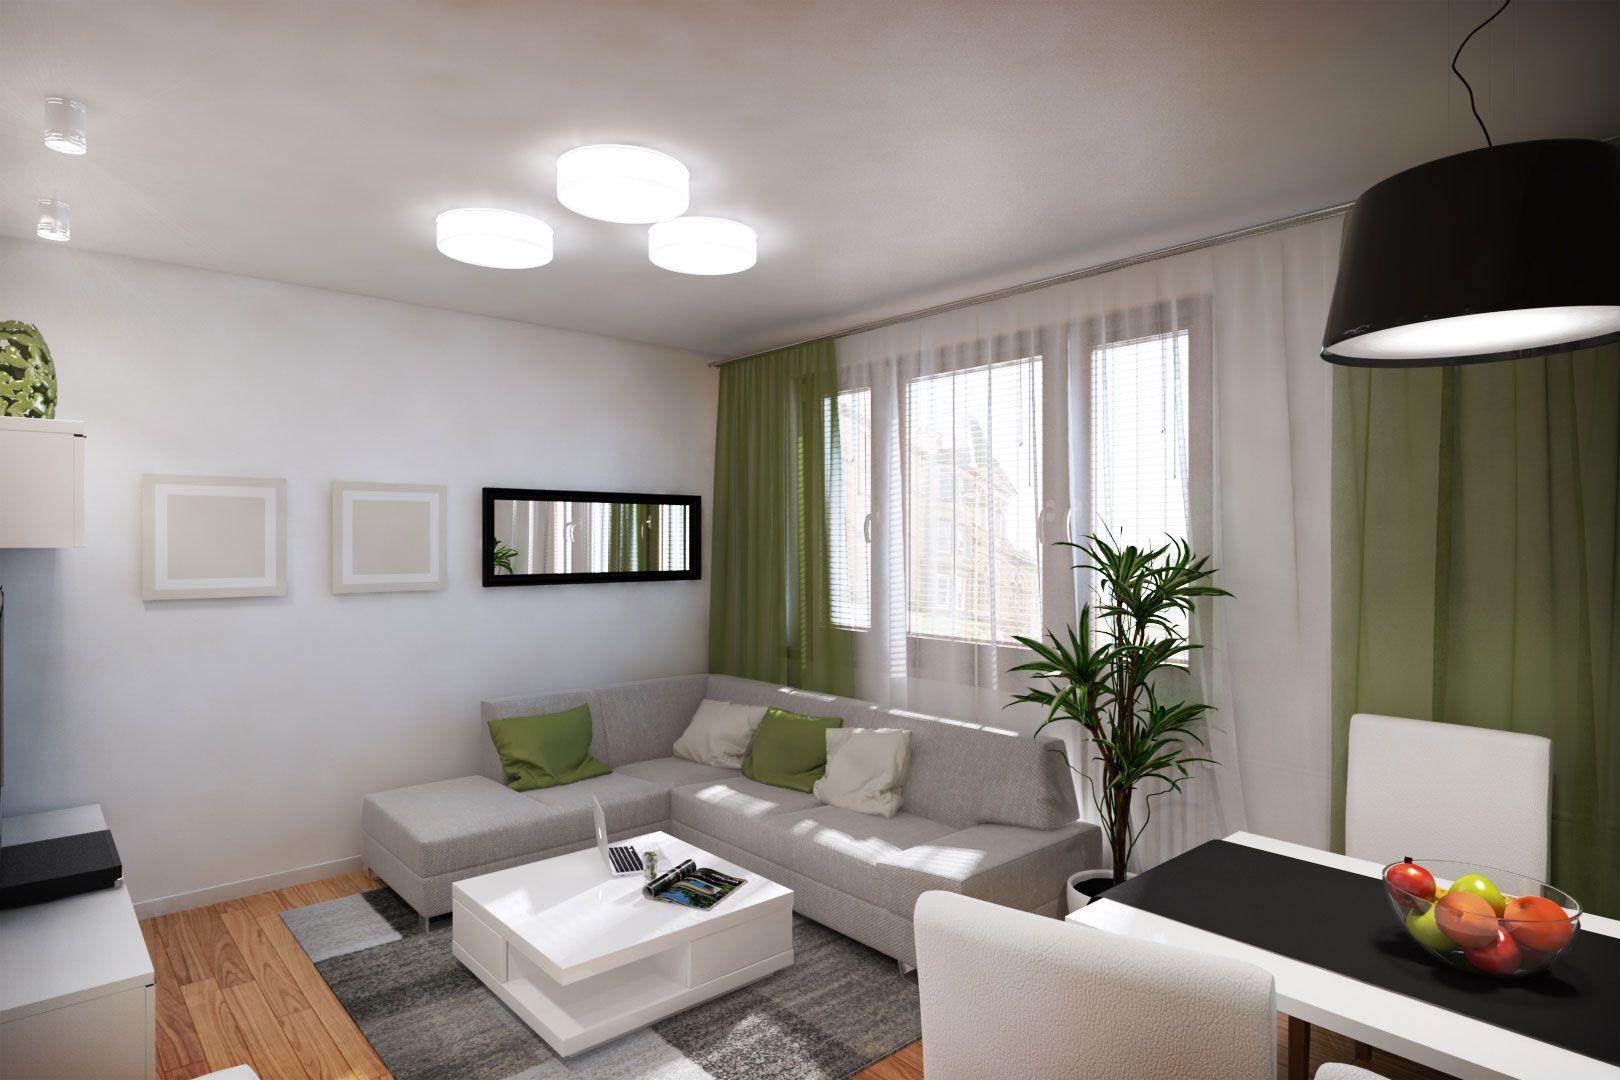 Dise o departamento peque o 62 m planos construye hogar for Diseno de interiores departamento pequeno